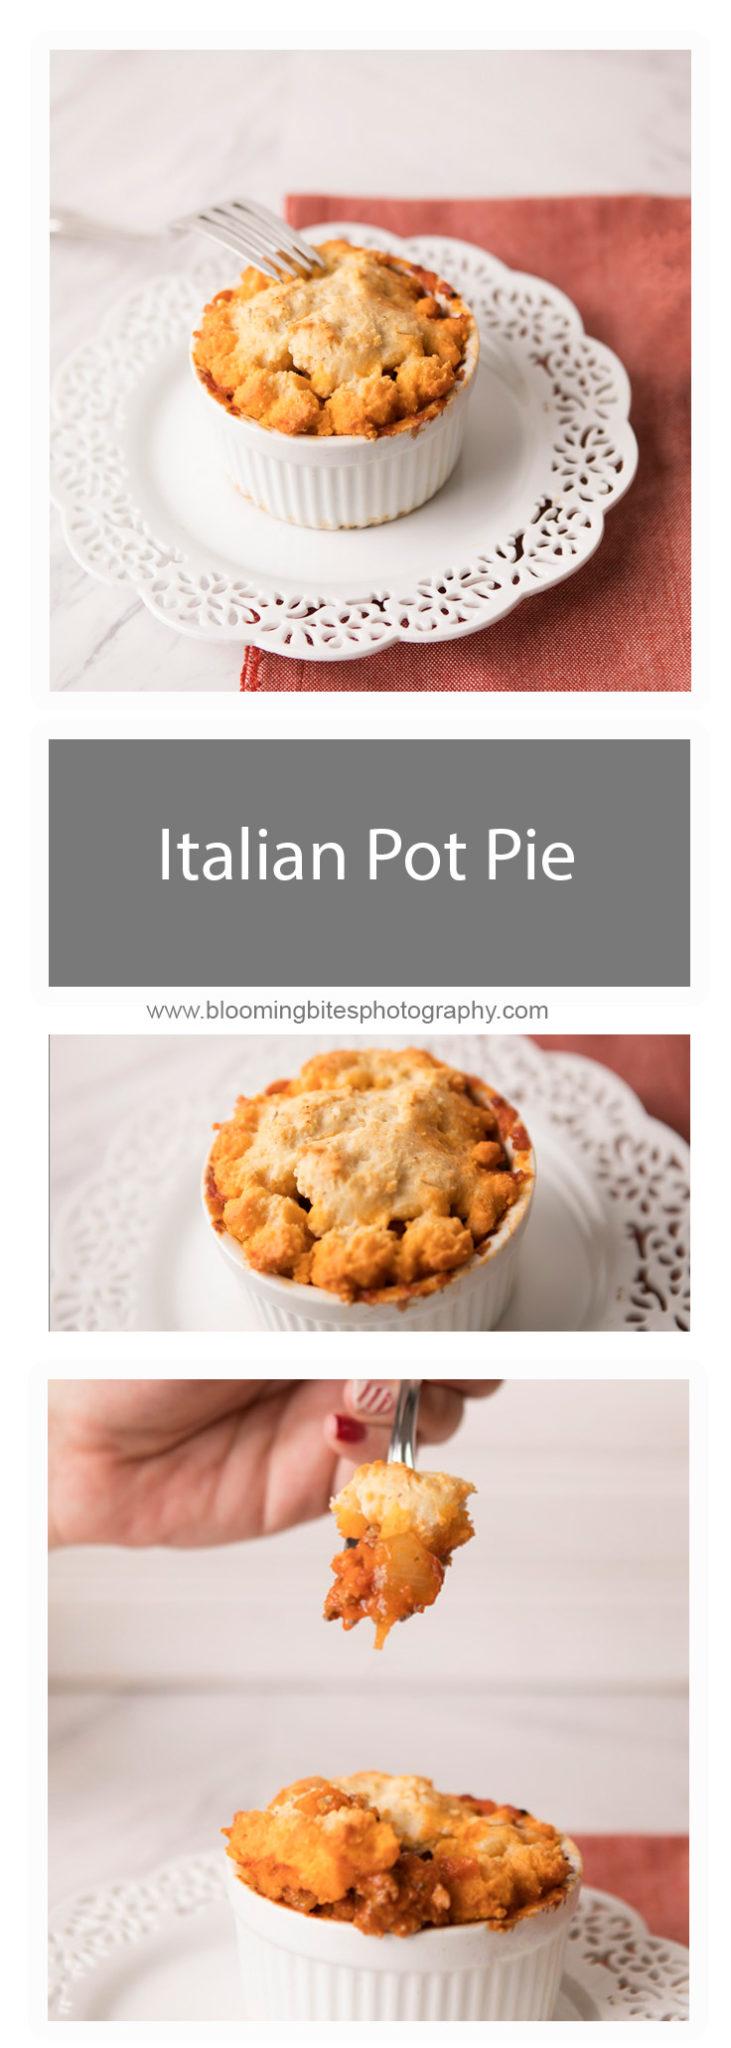 Italian Pot Pie - Blooming Bites